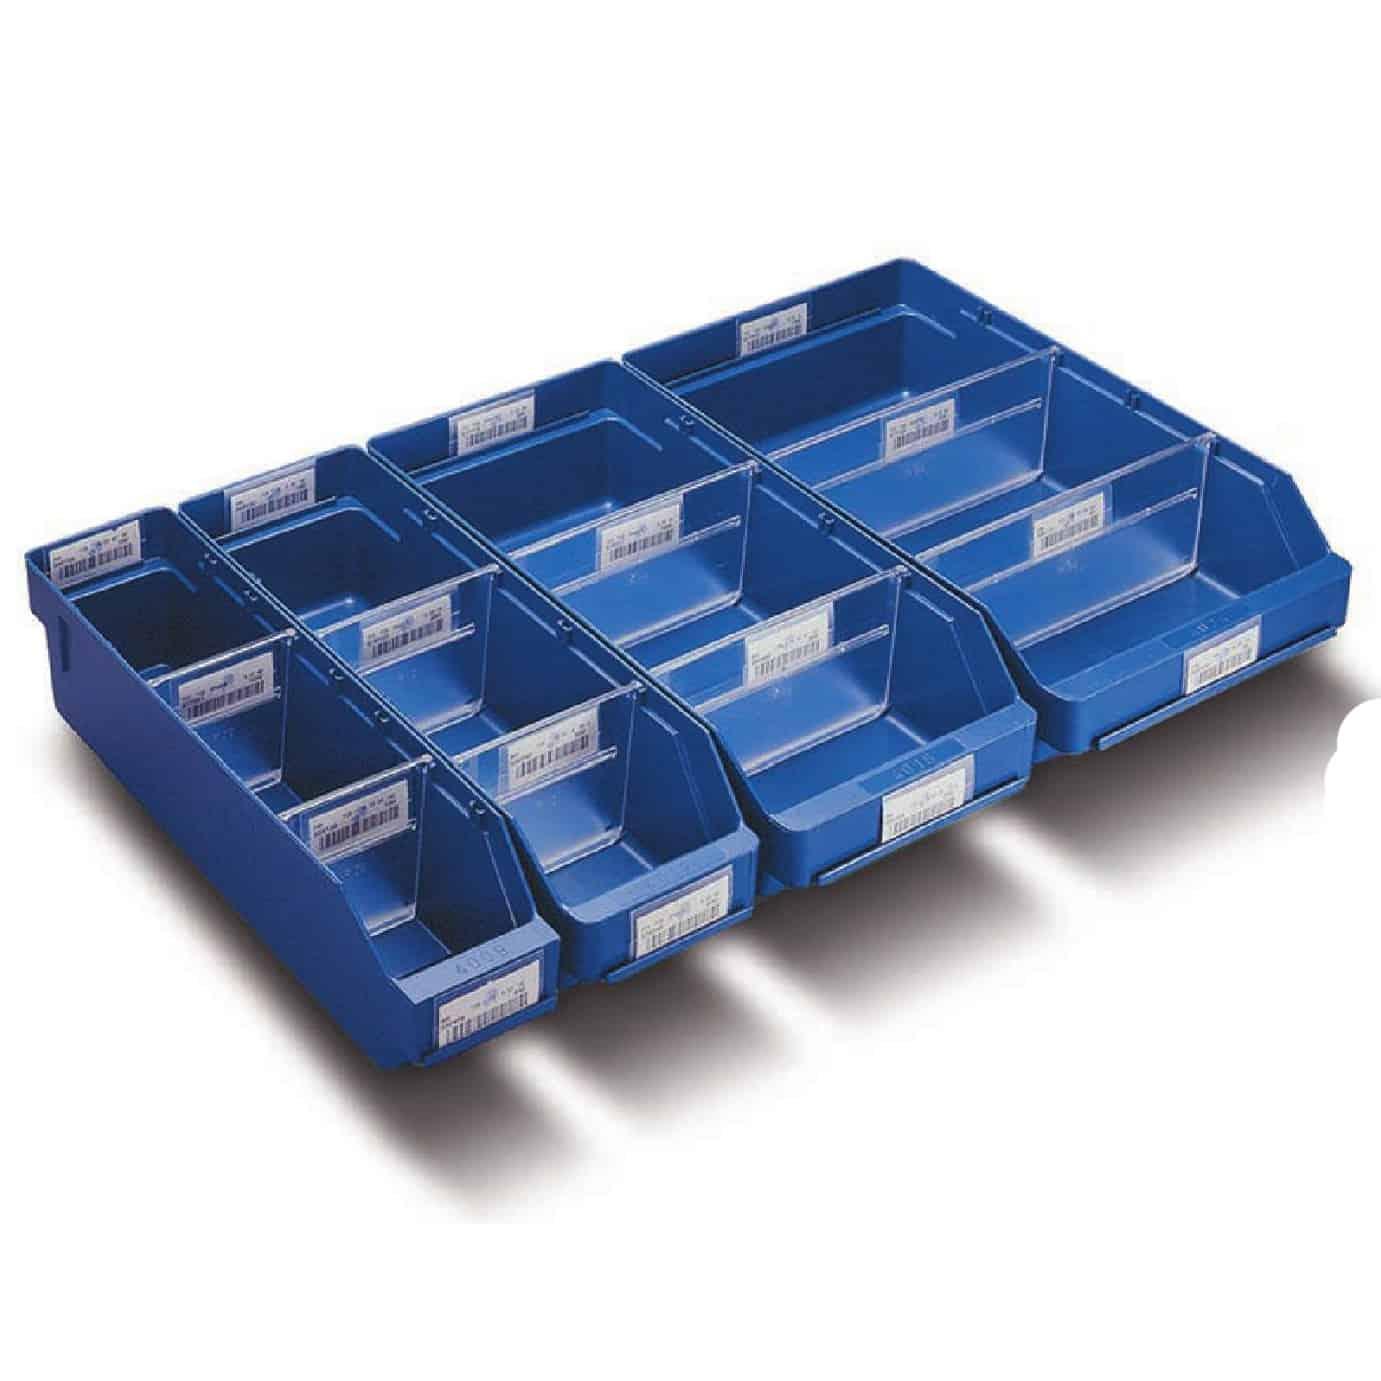 Barton Topstore Semi-Open Fronted Shelf Bin Dividers